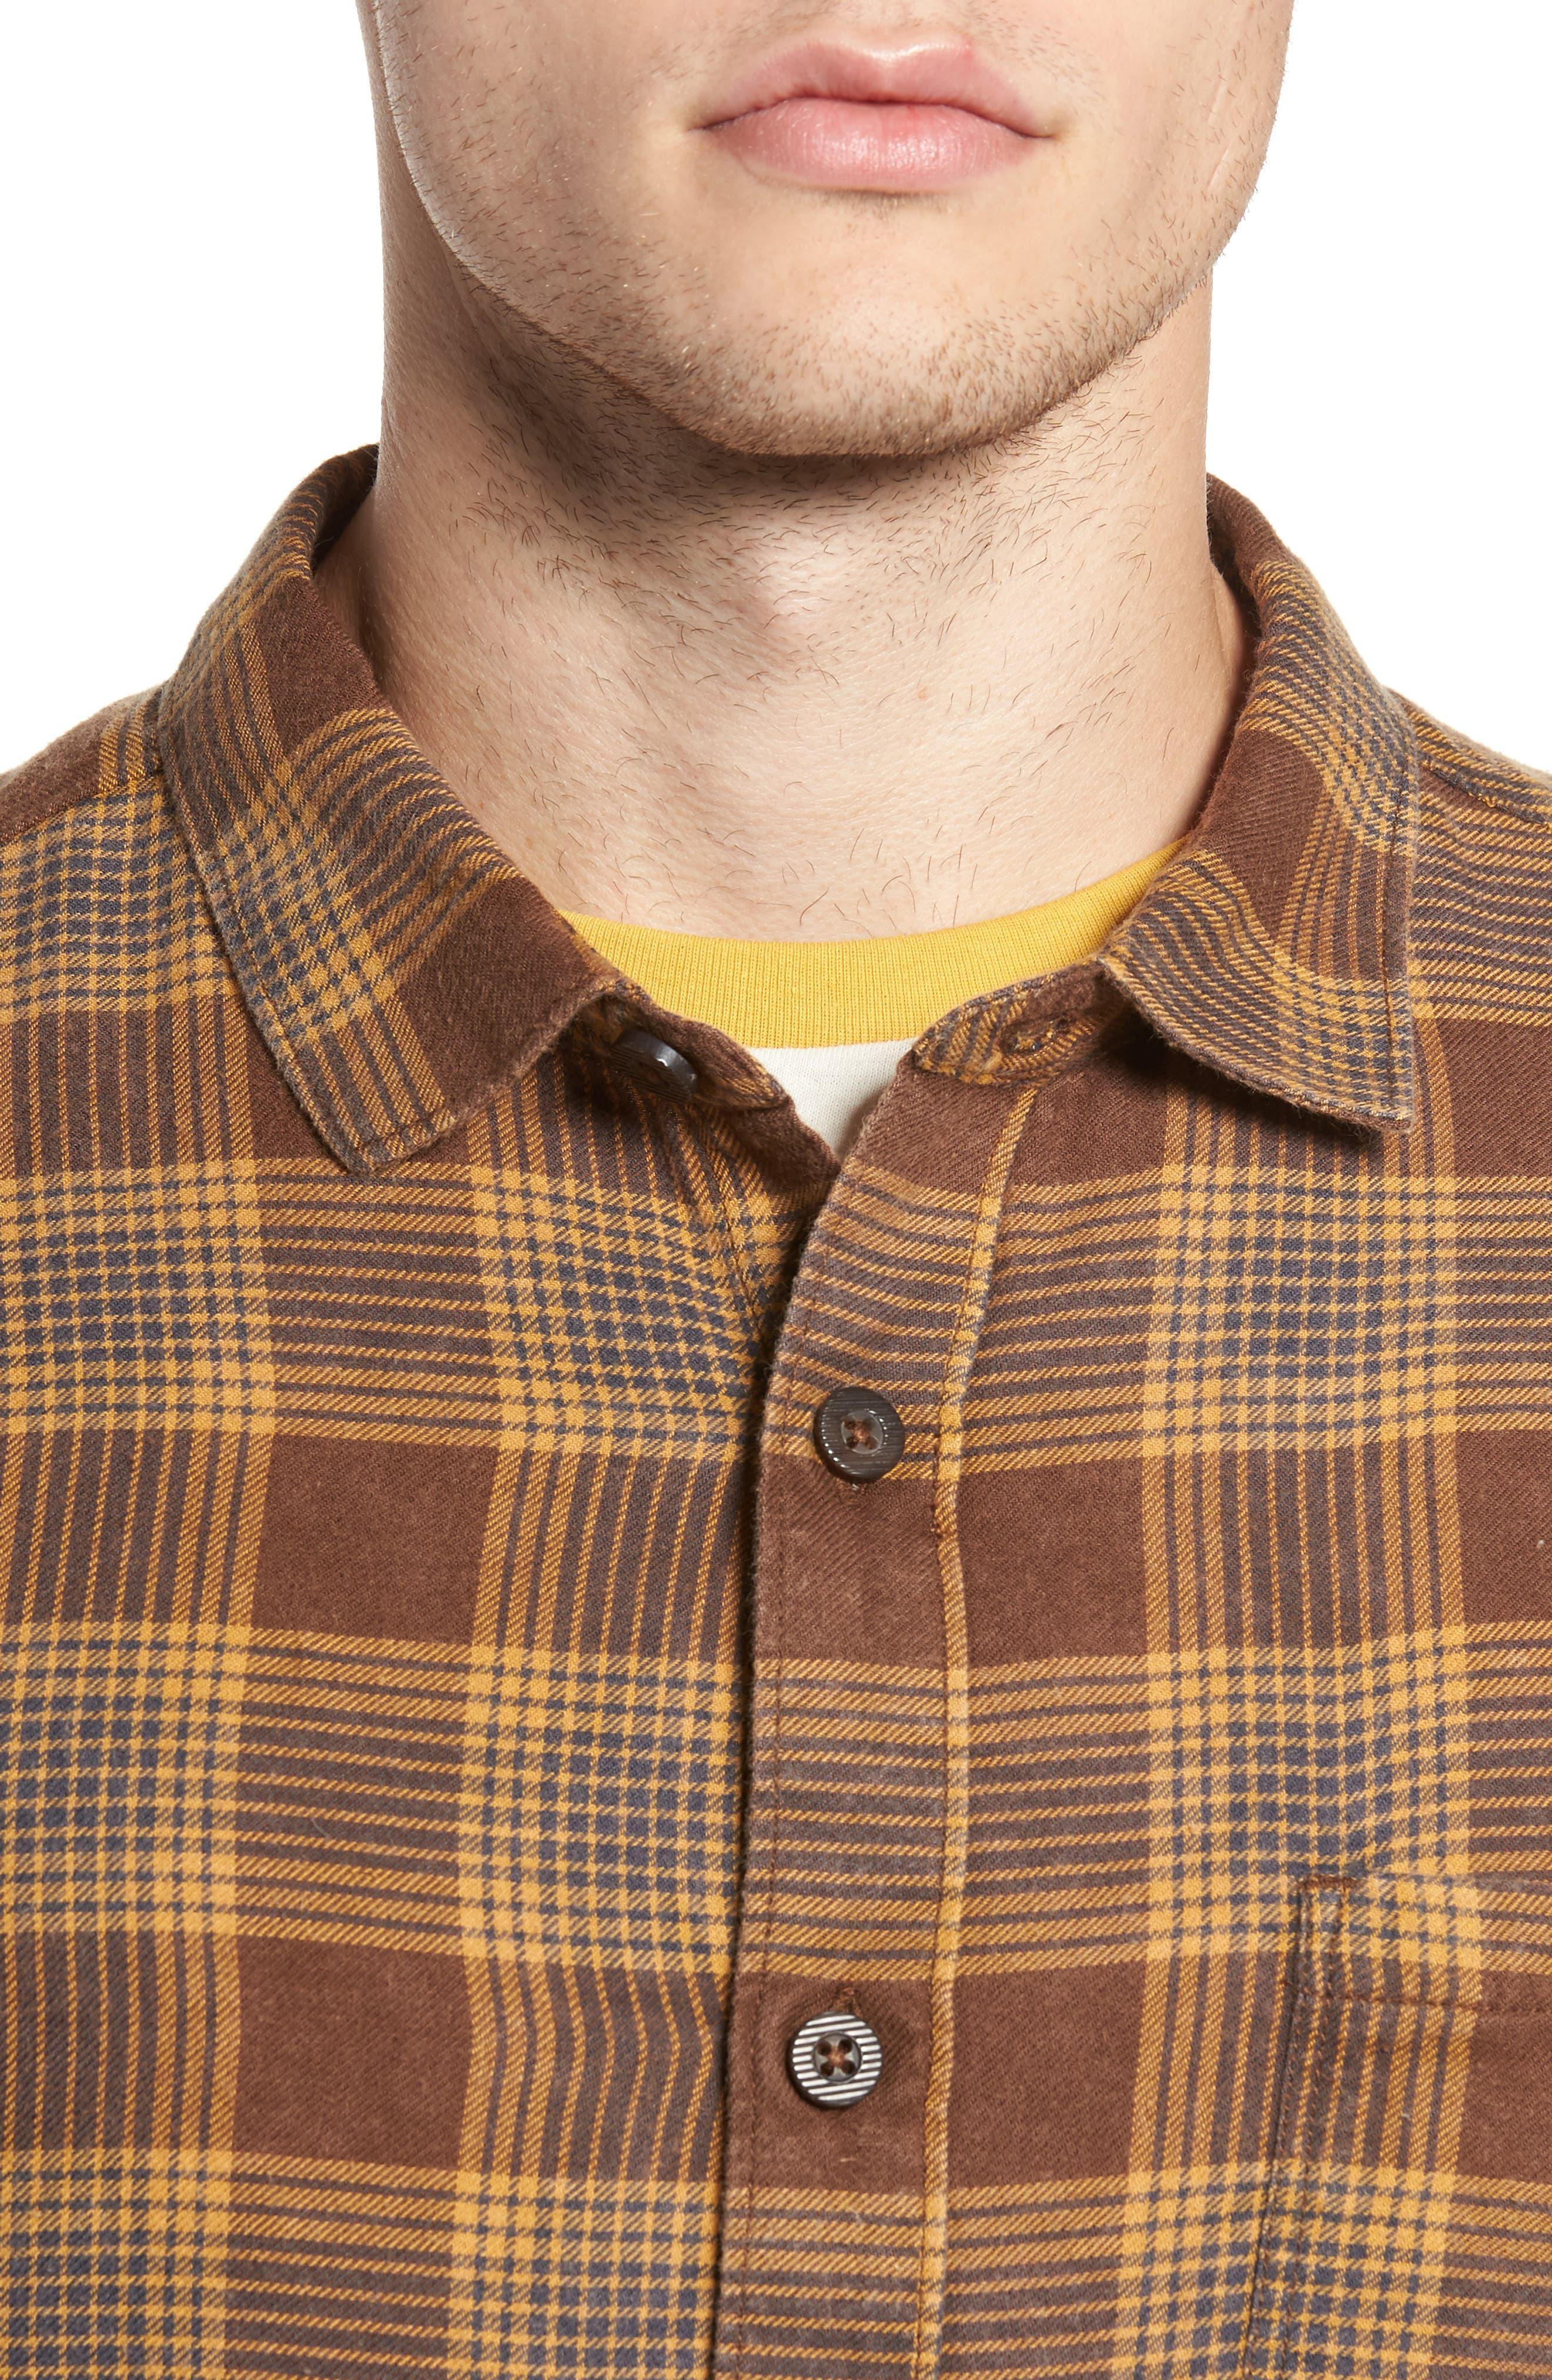 Freemont Flannel Shirt,                             Alternate thumbnail 4, color,                             205